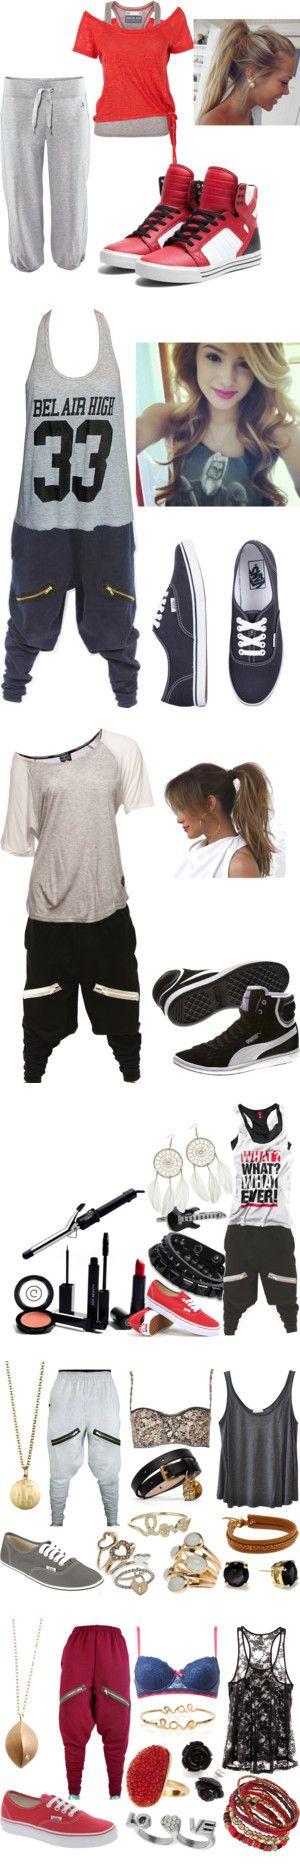 """Dance outfits #2"" by heyitzbriannaa ❤ liked on Polyvore-yep yep yep! Love it ☺️"